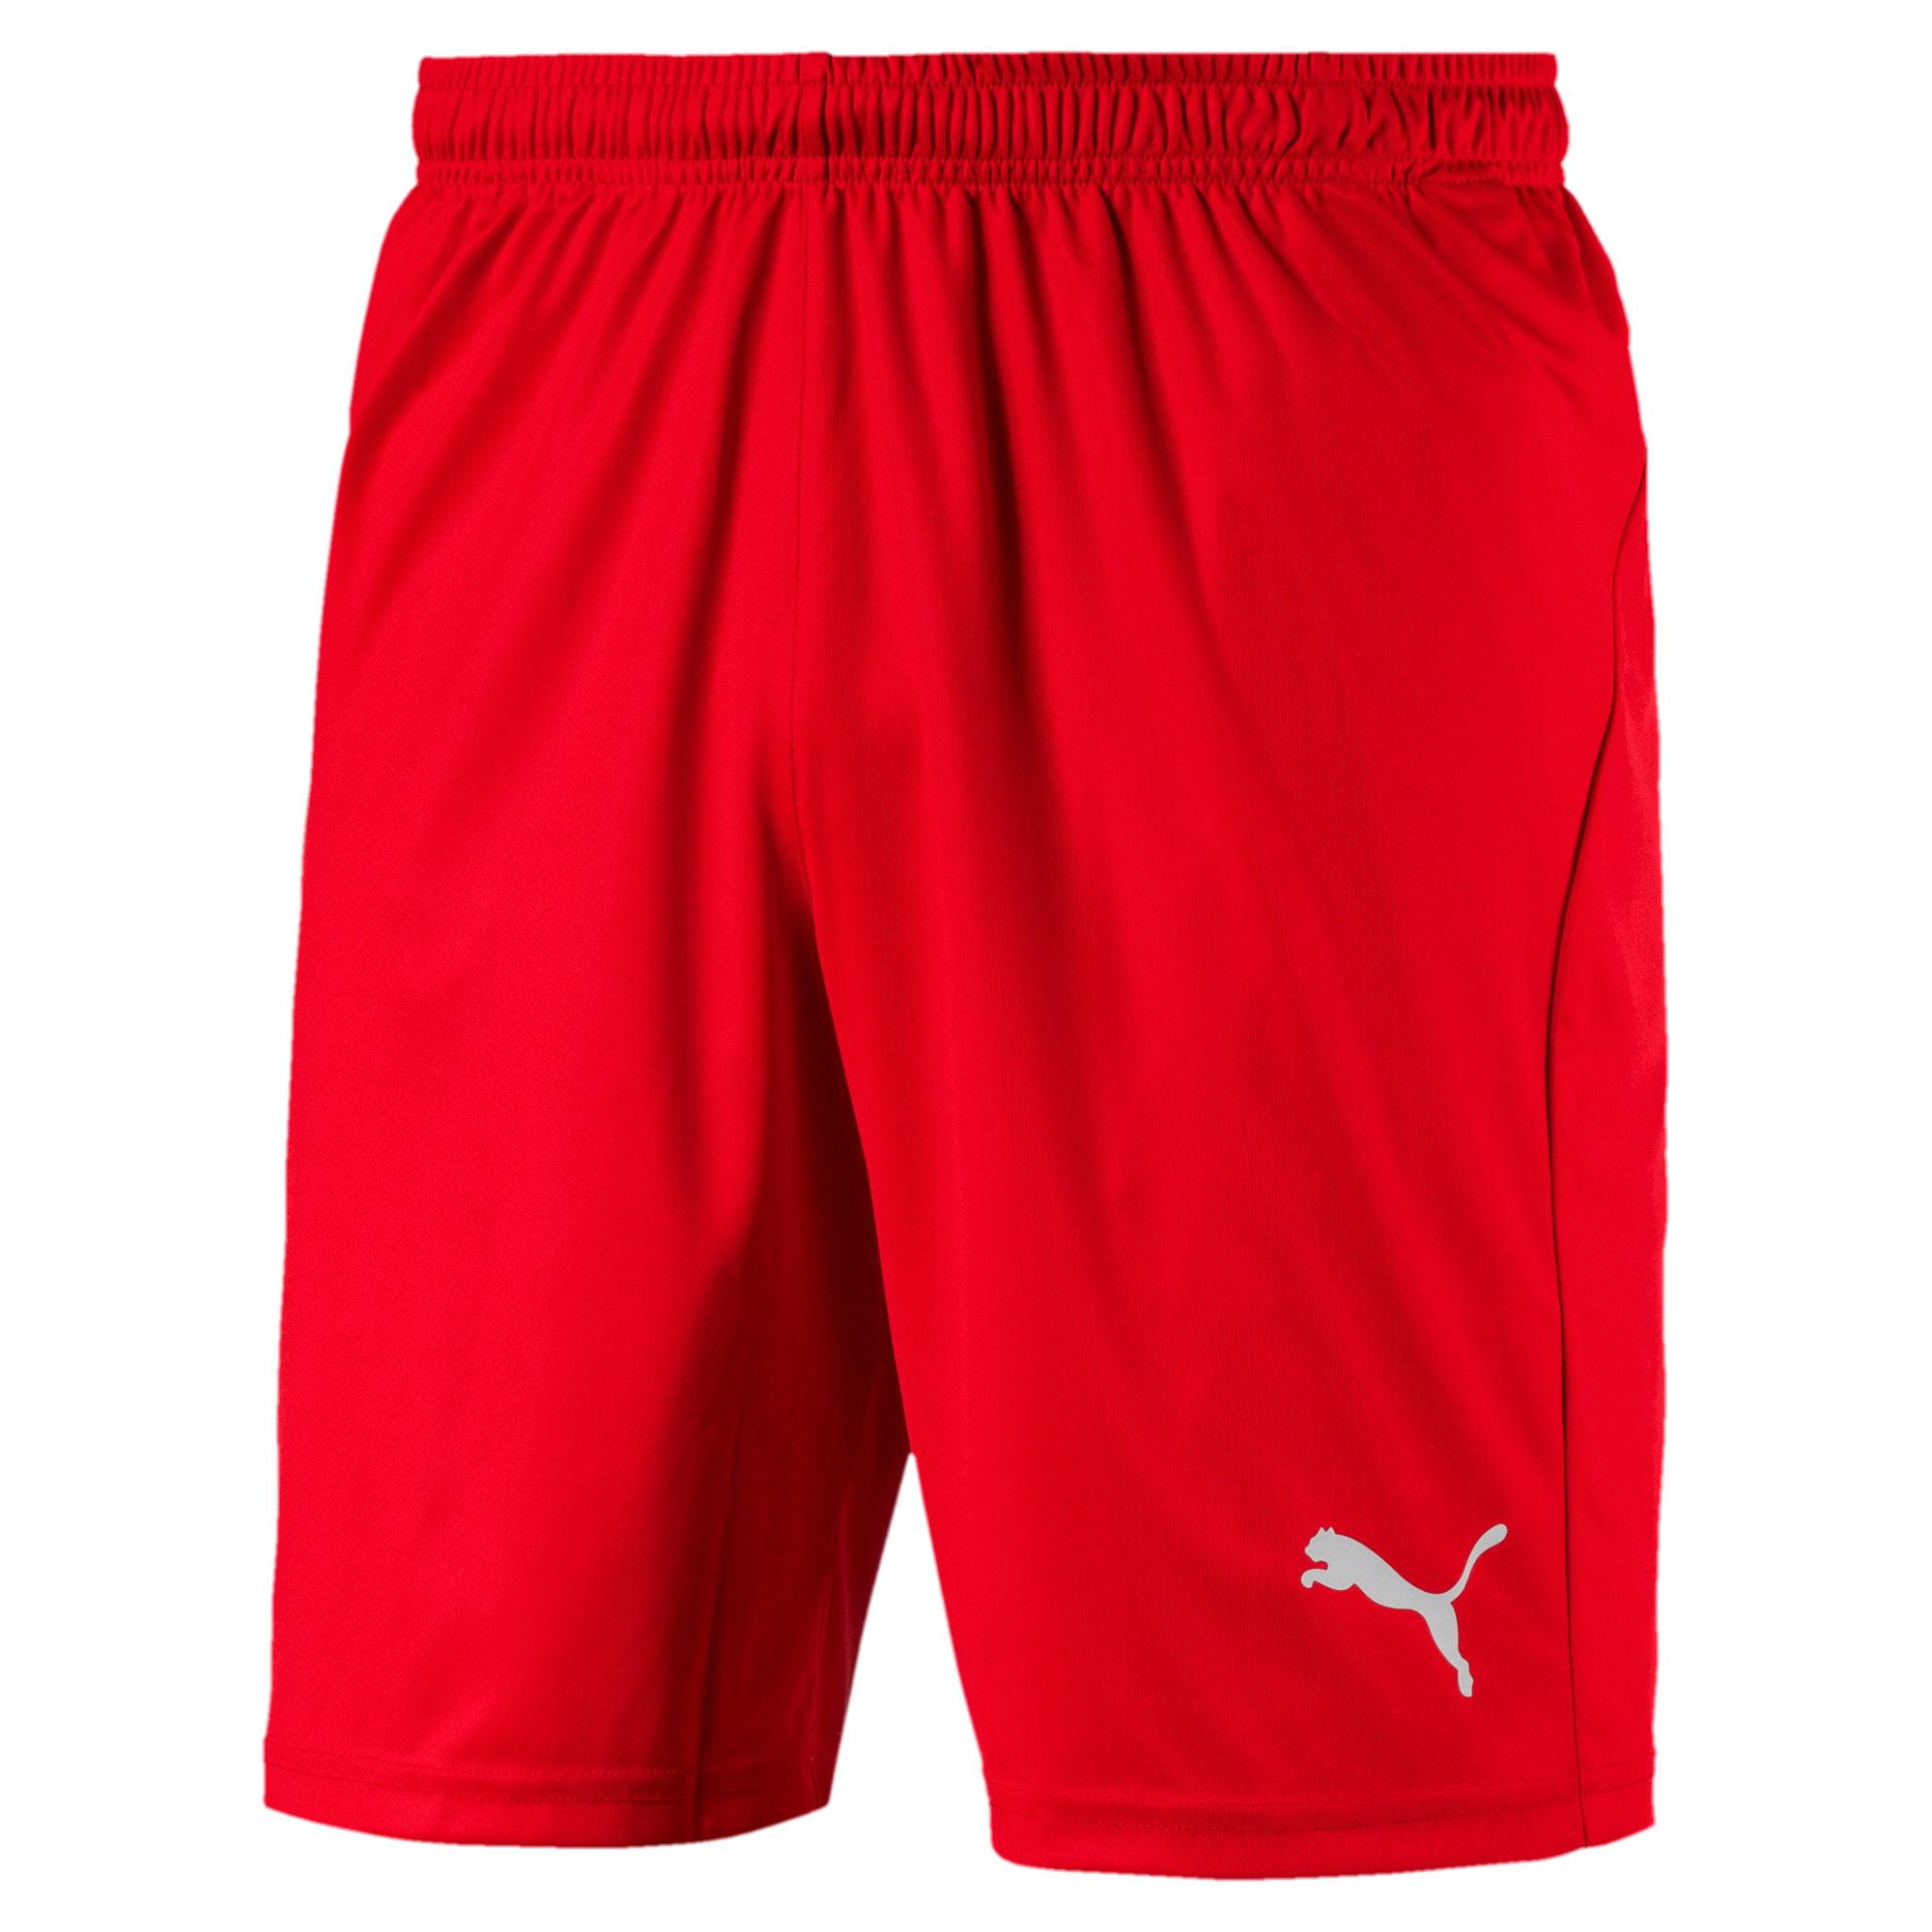 Thumbnail 4 of Liga Core Men's Shorts, Puma Red-Puma White, medium